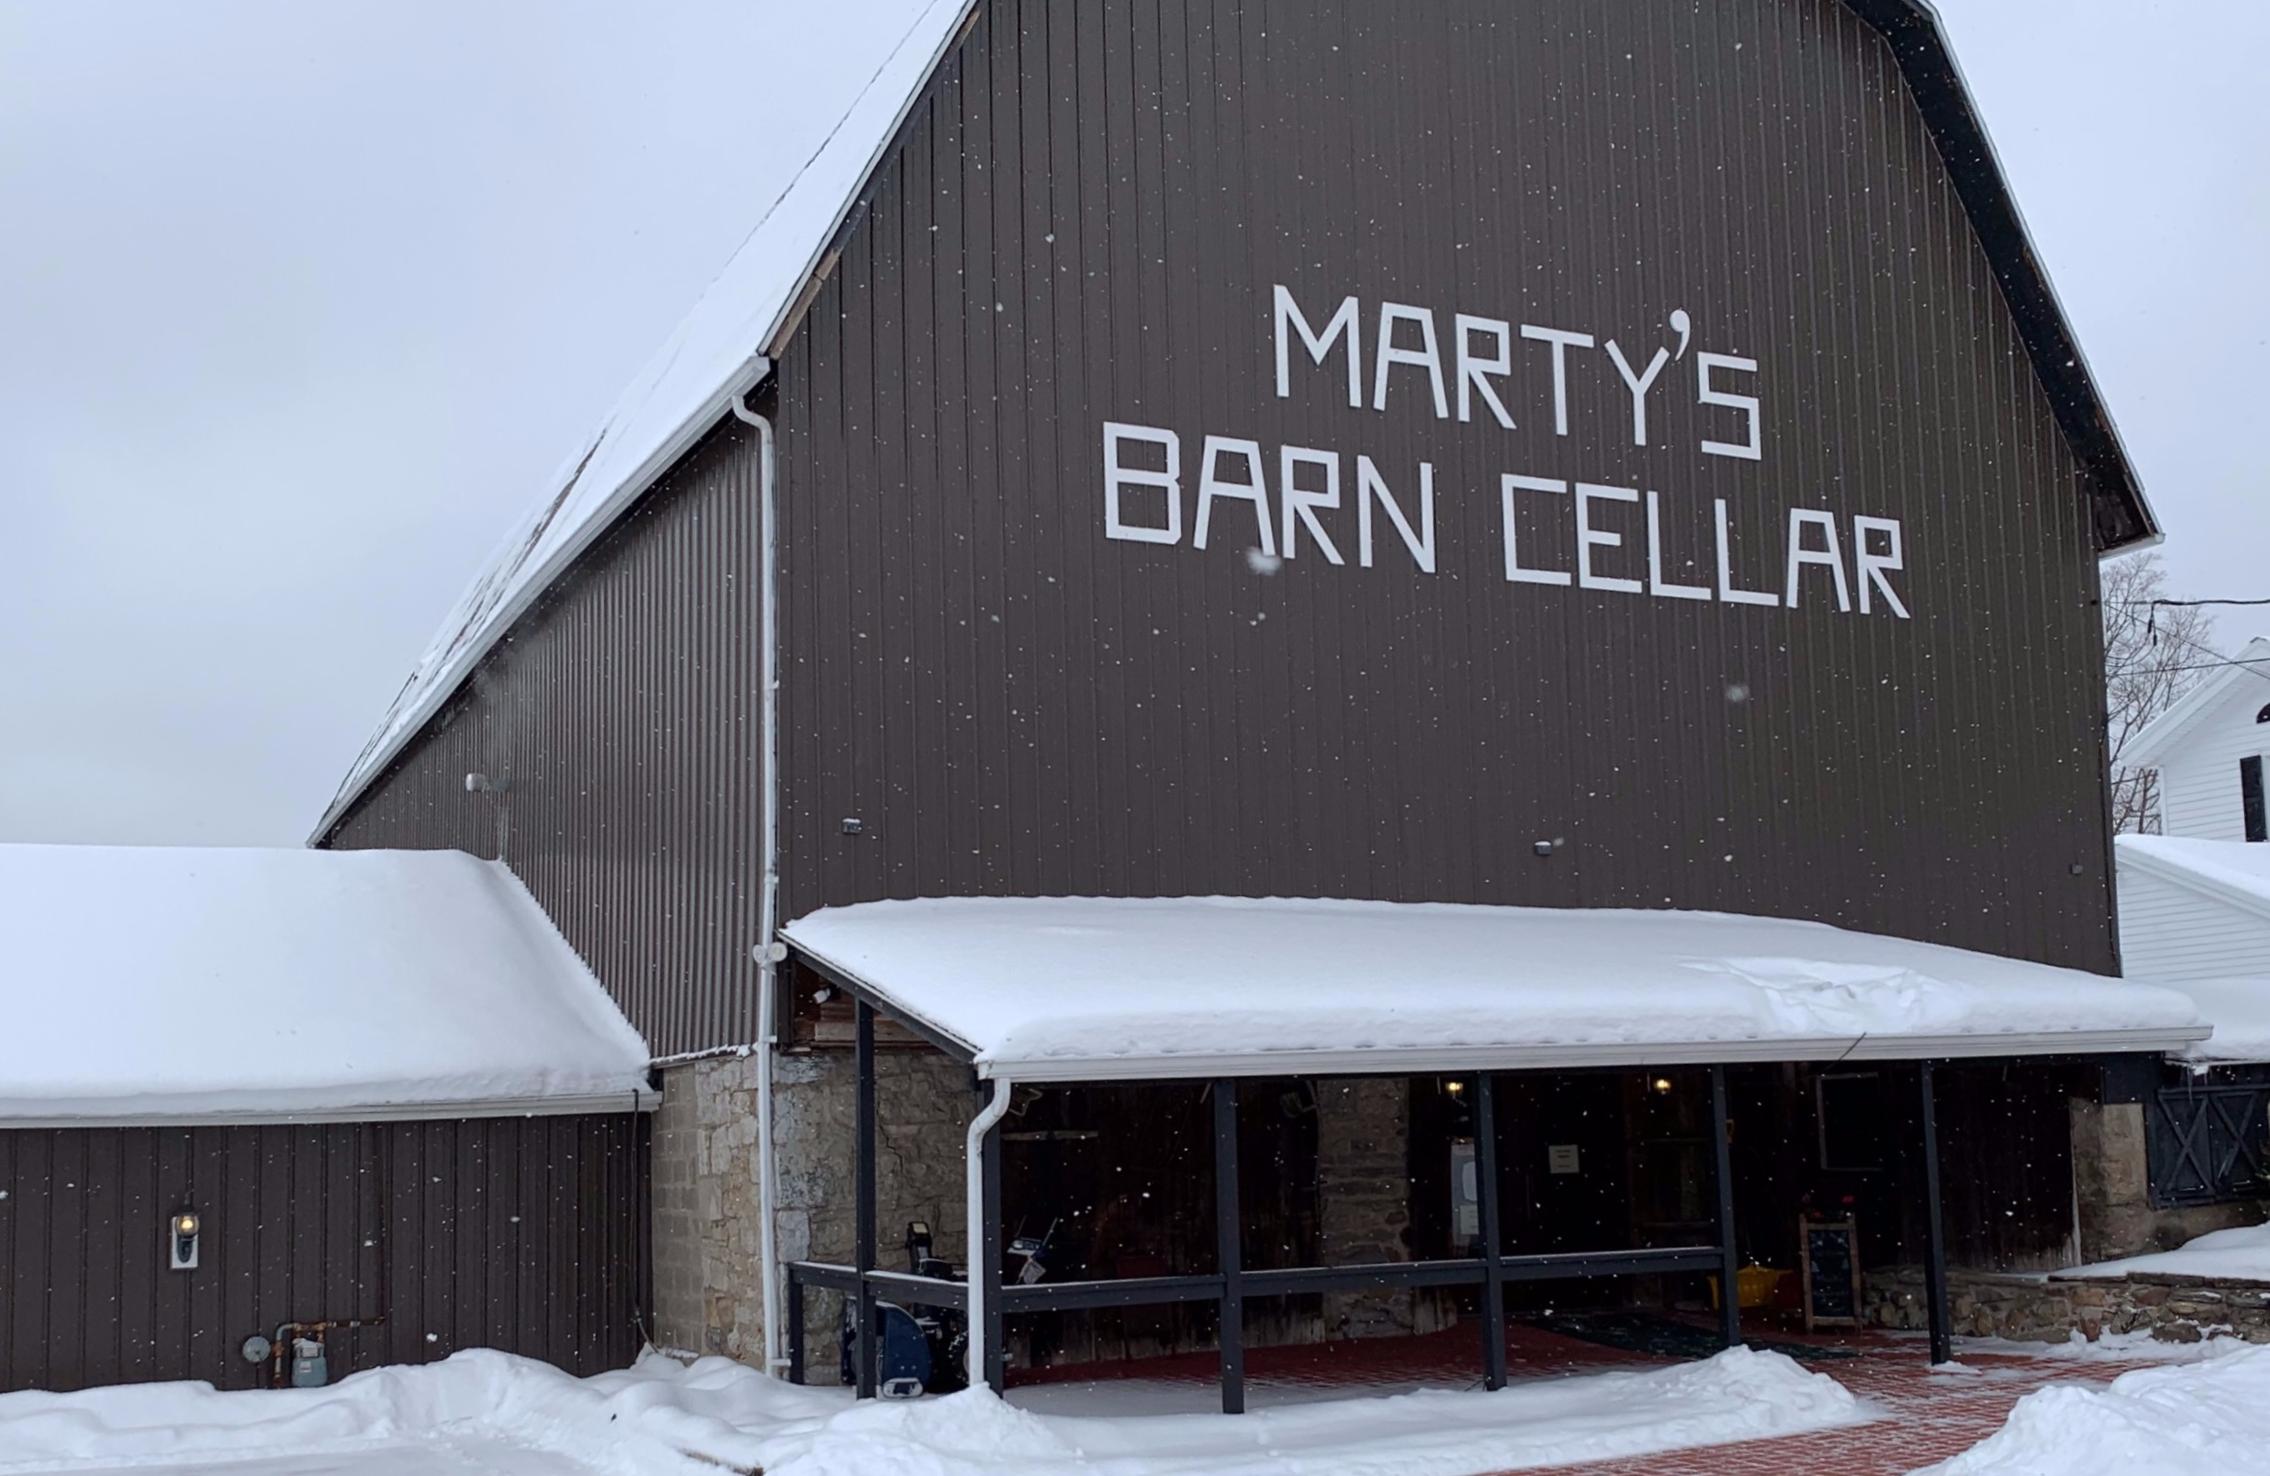 Marty's Barn Cellar